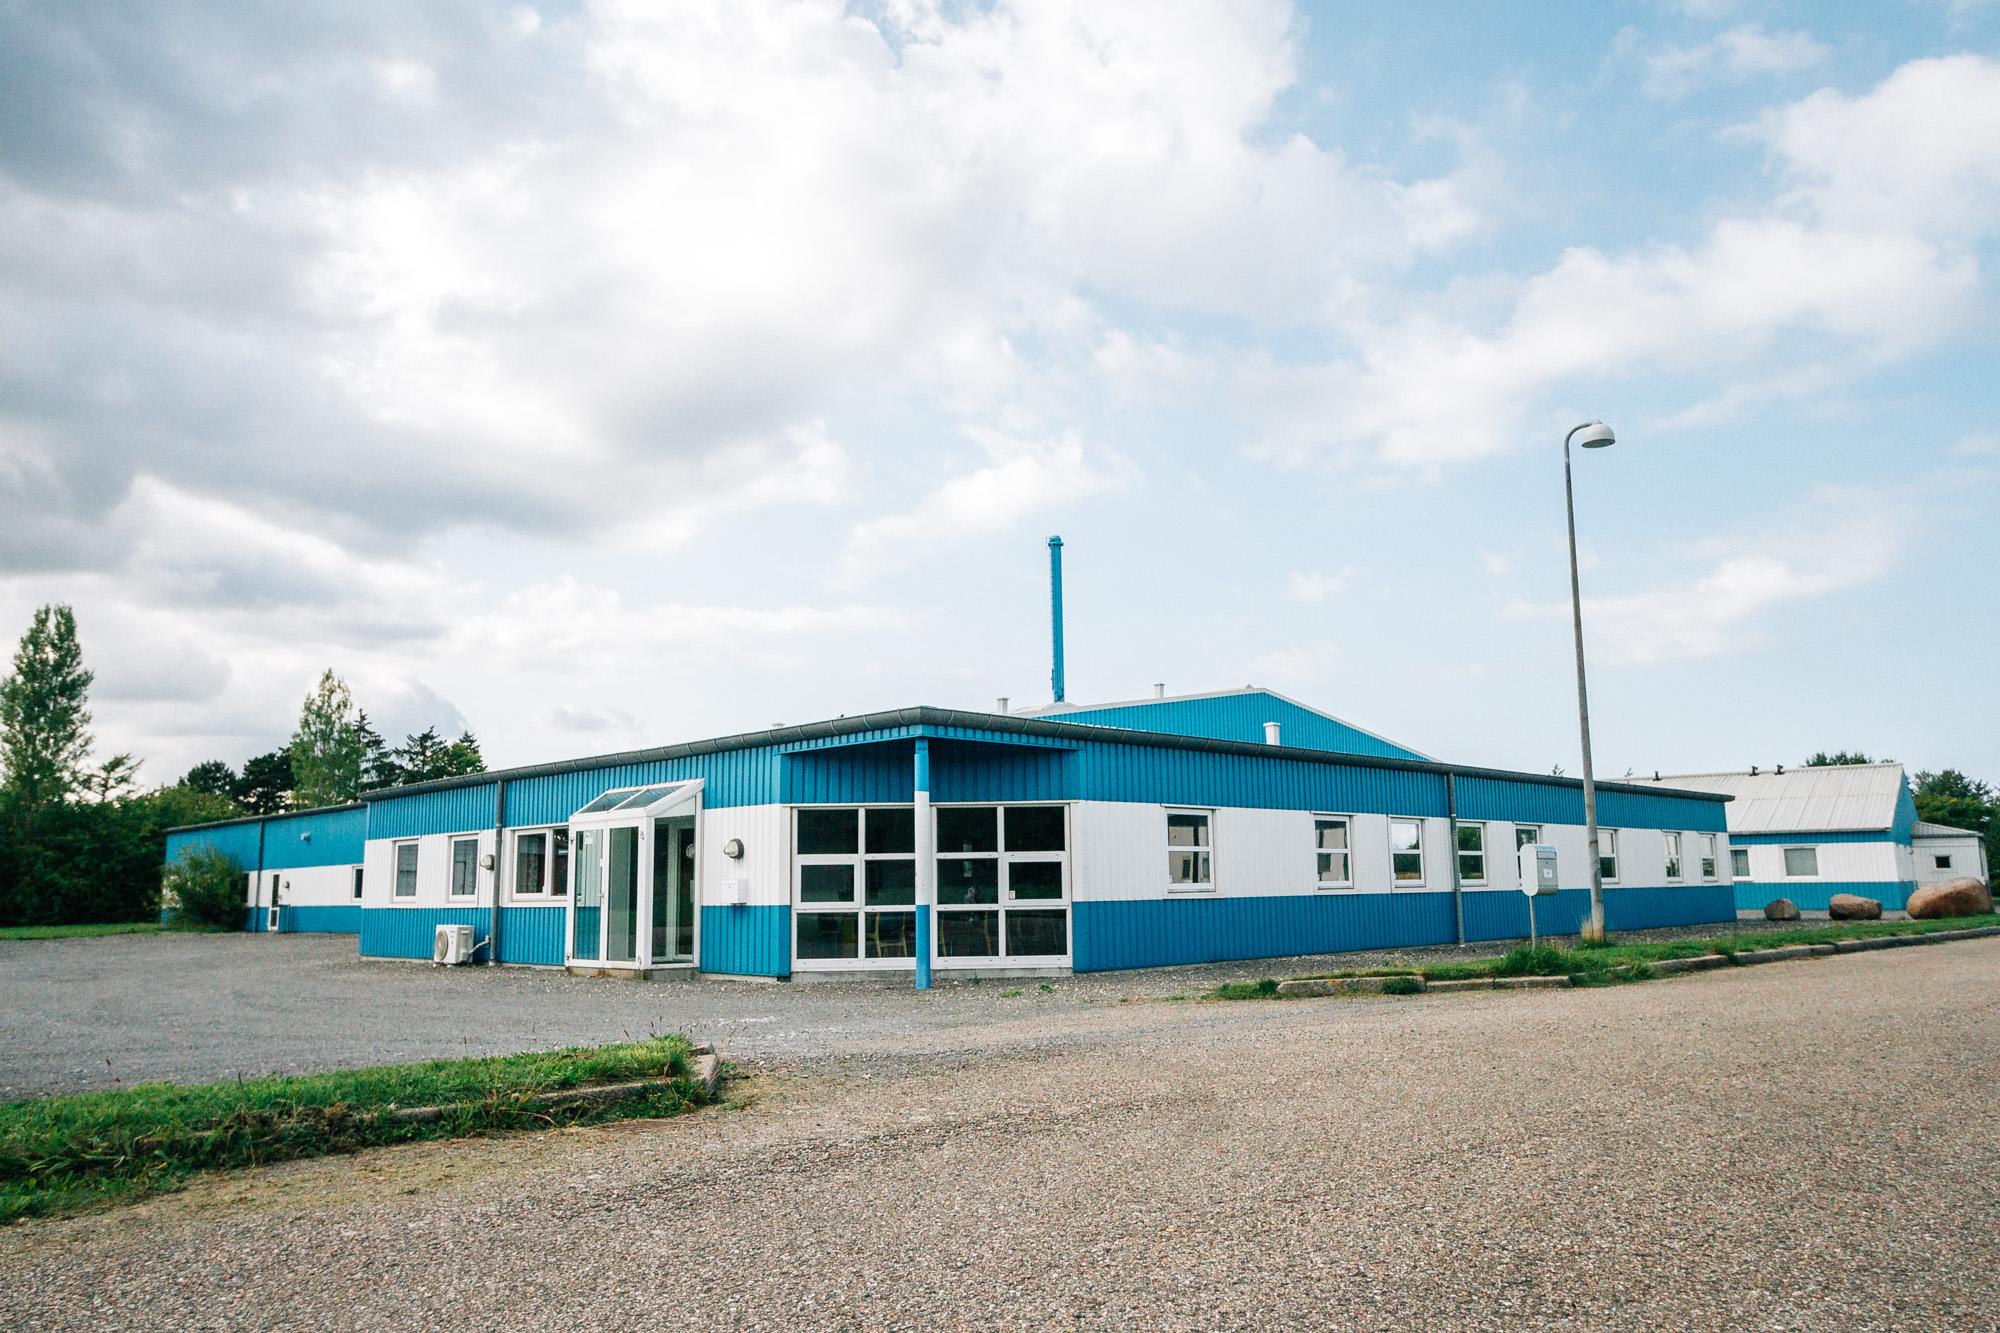 Ossi-Connectors-FJH-die-Steckverbinder-GmbH-47